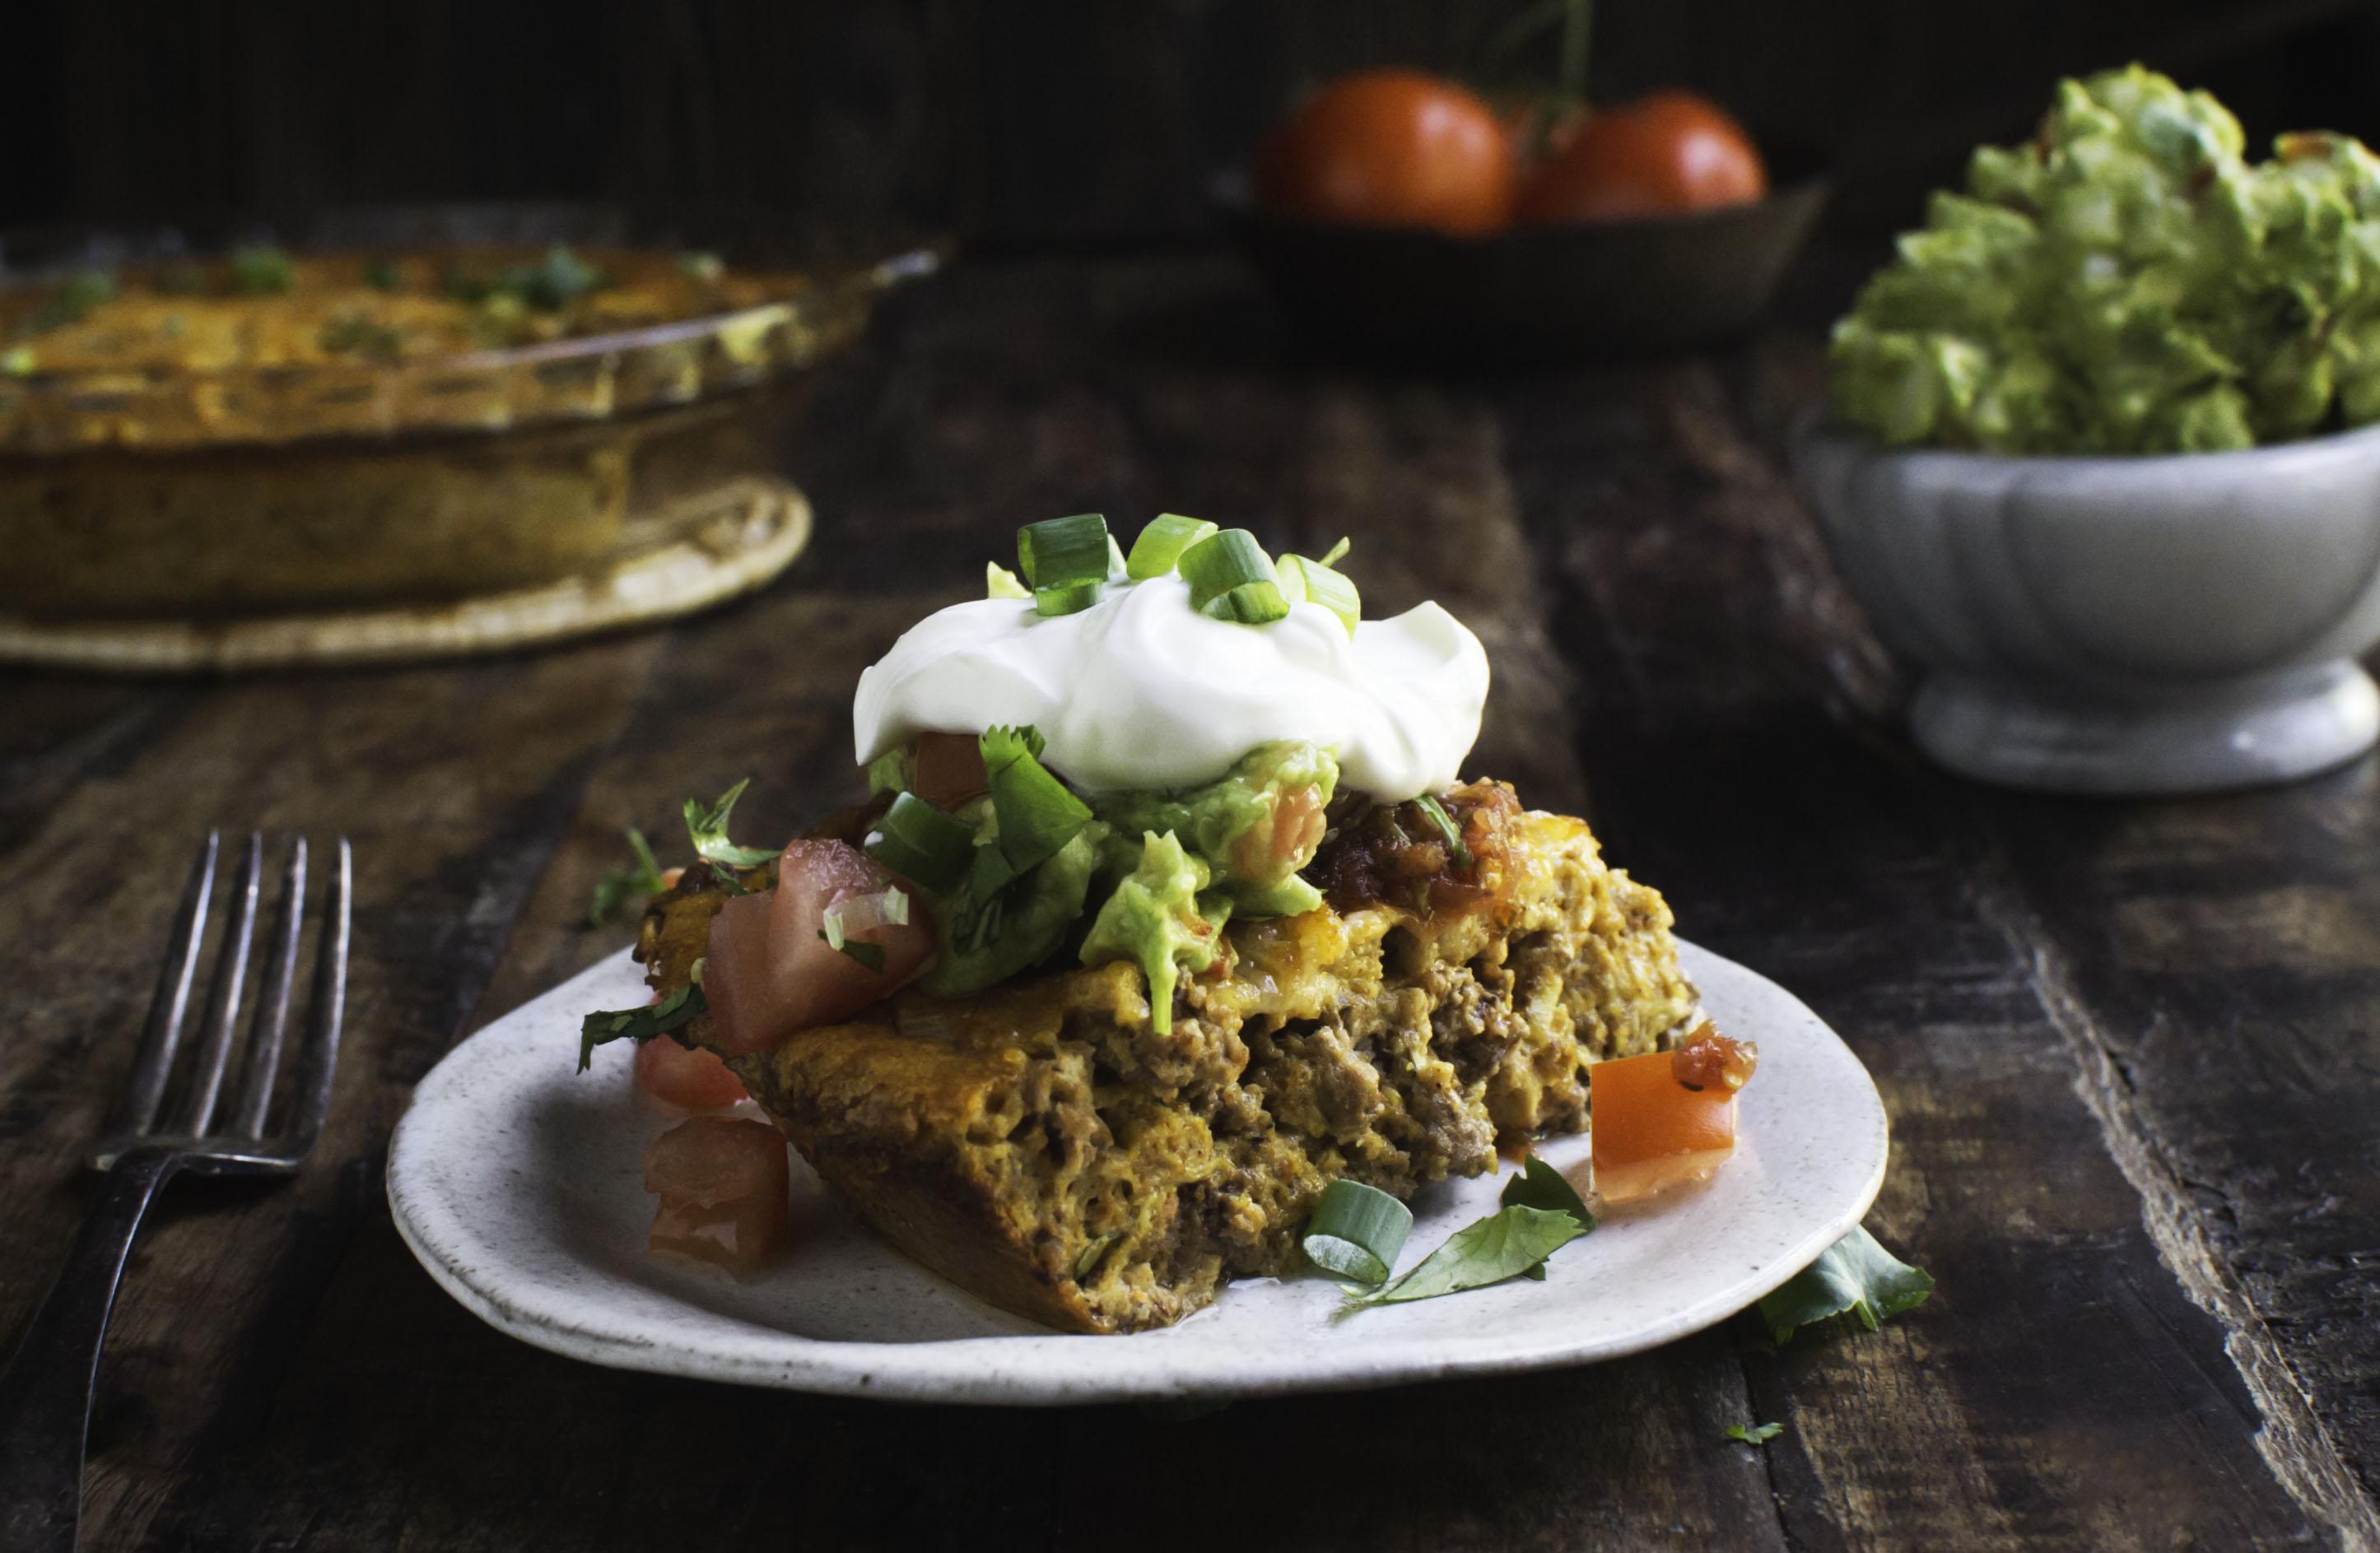 4f5e892450e41 Delicious Low-Carb Crustless Taco Pie Recipe - Simply So Healthy